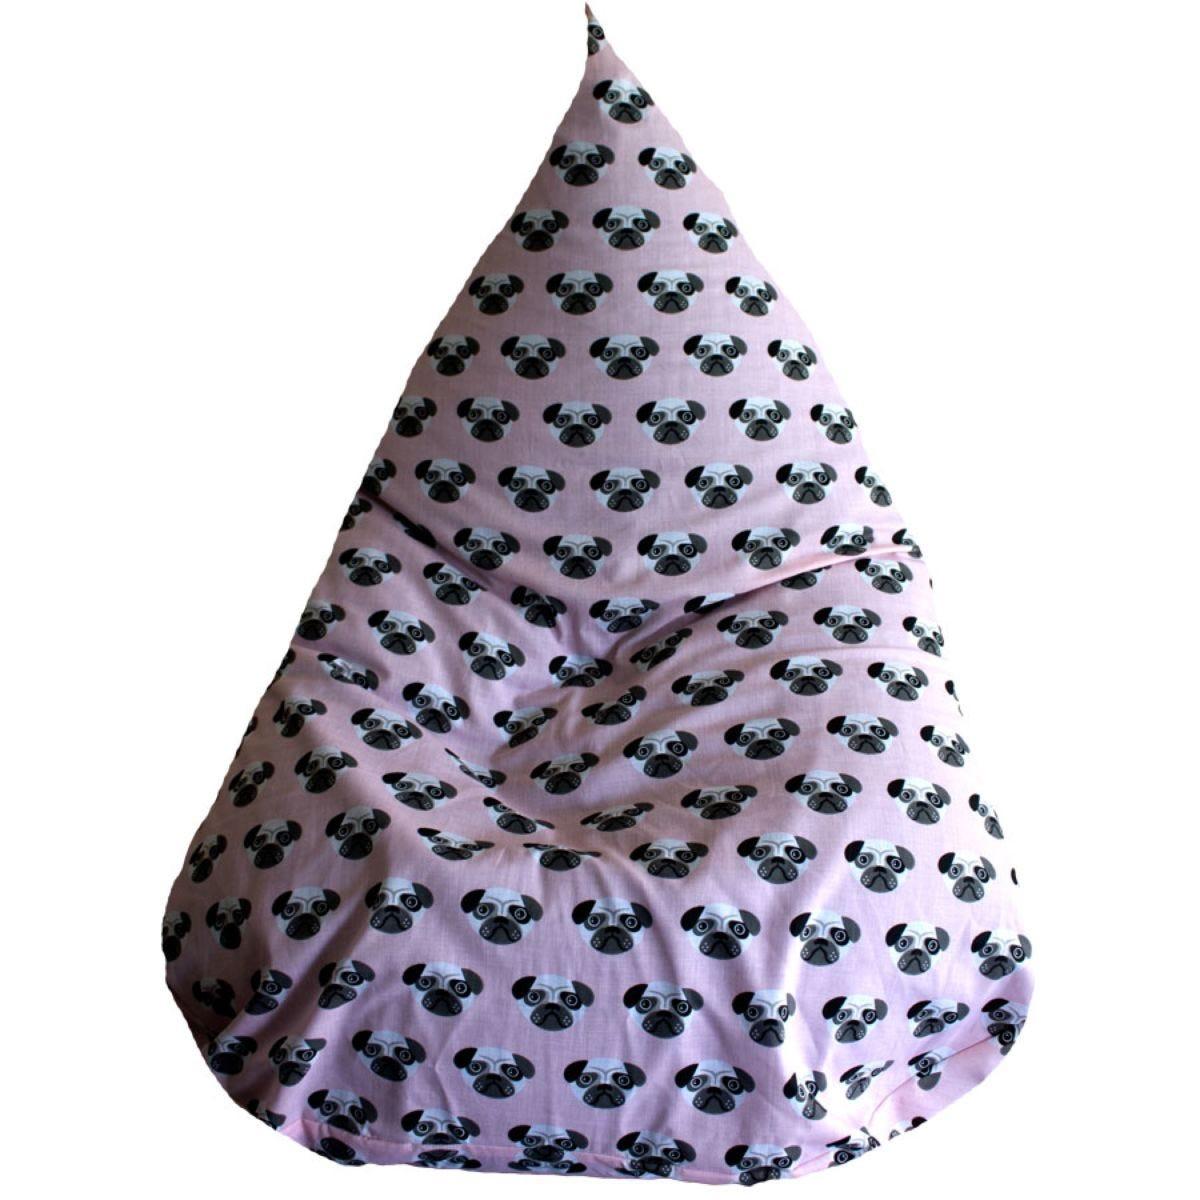 Cuddle Bed™ Medium Tear Drop Cotton Bean Bag - Pink Pug